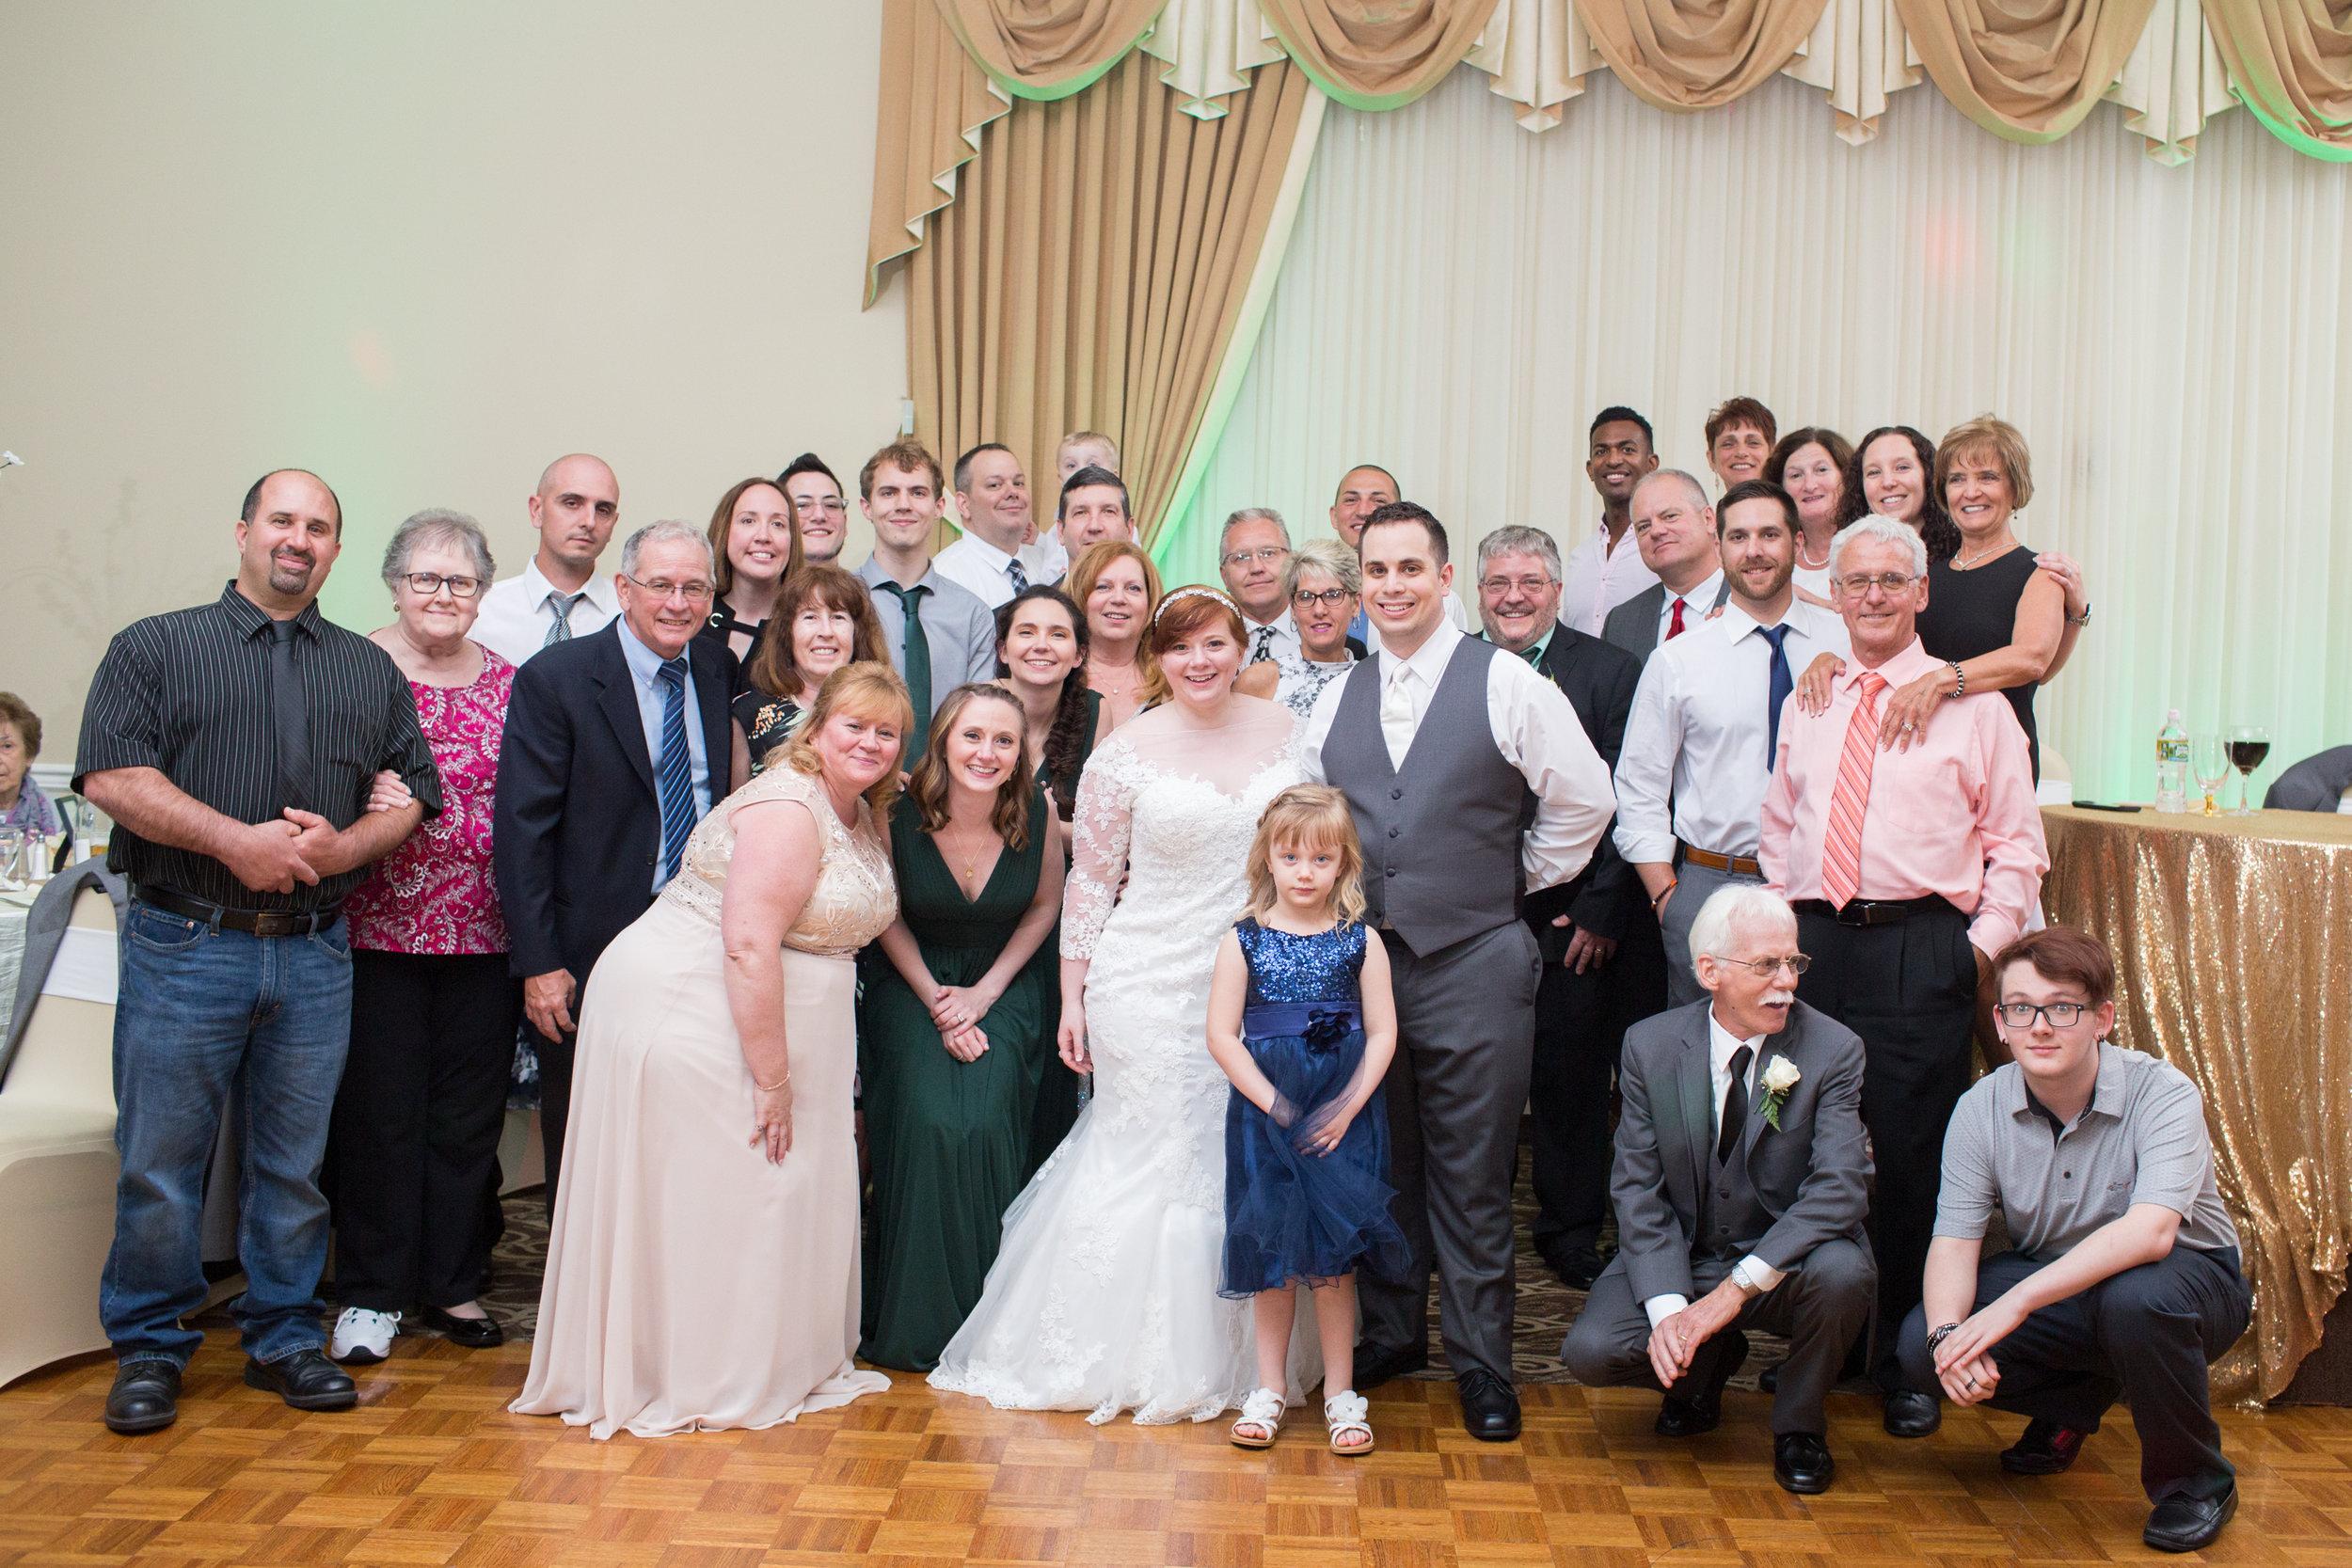 Fiorellis Wedding Photos_JDP-175.jpg